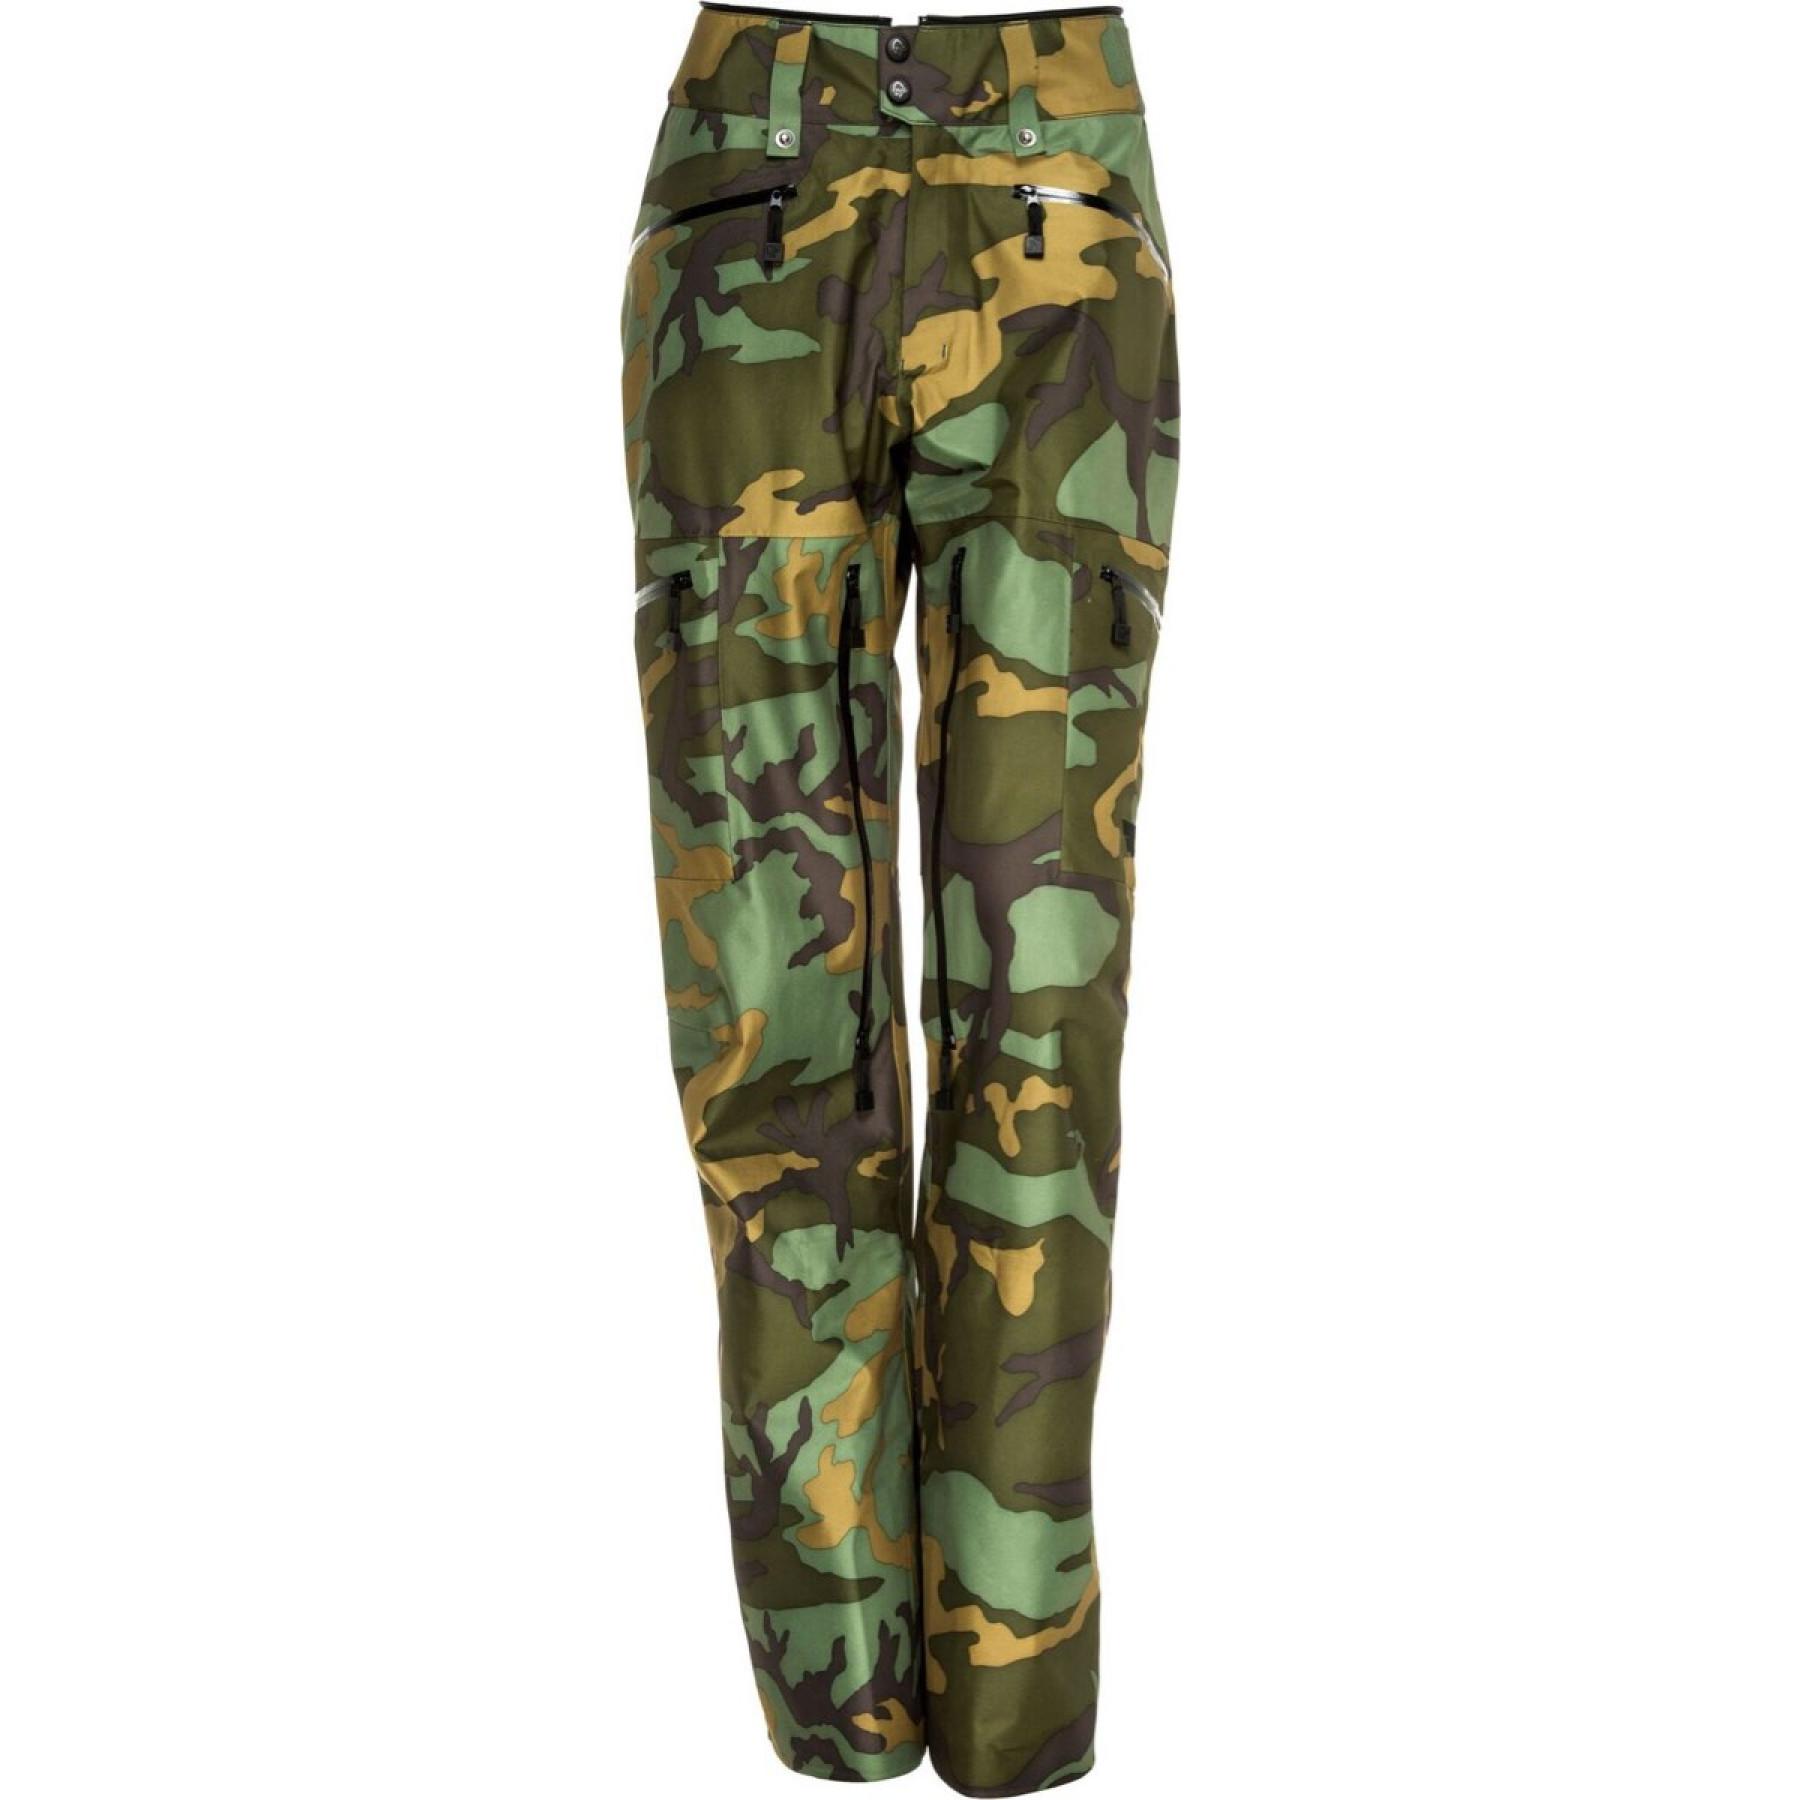 0e49d325 Norrøna Tamok Gore-Tex Pants Ltd (W) Green Camo